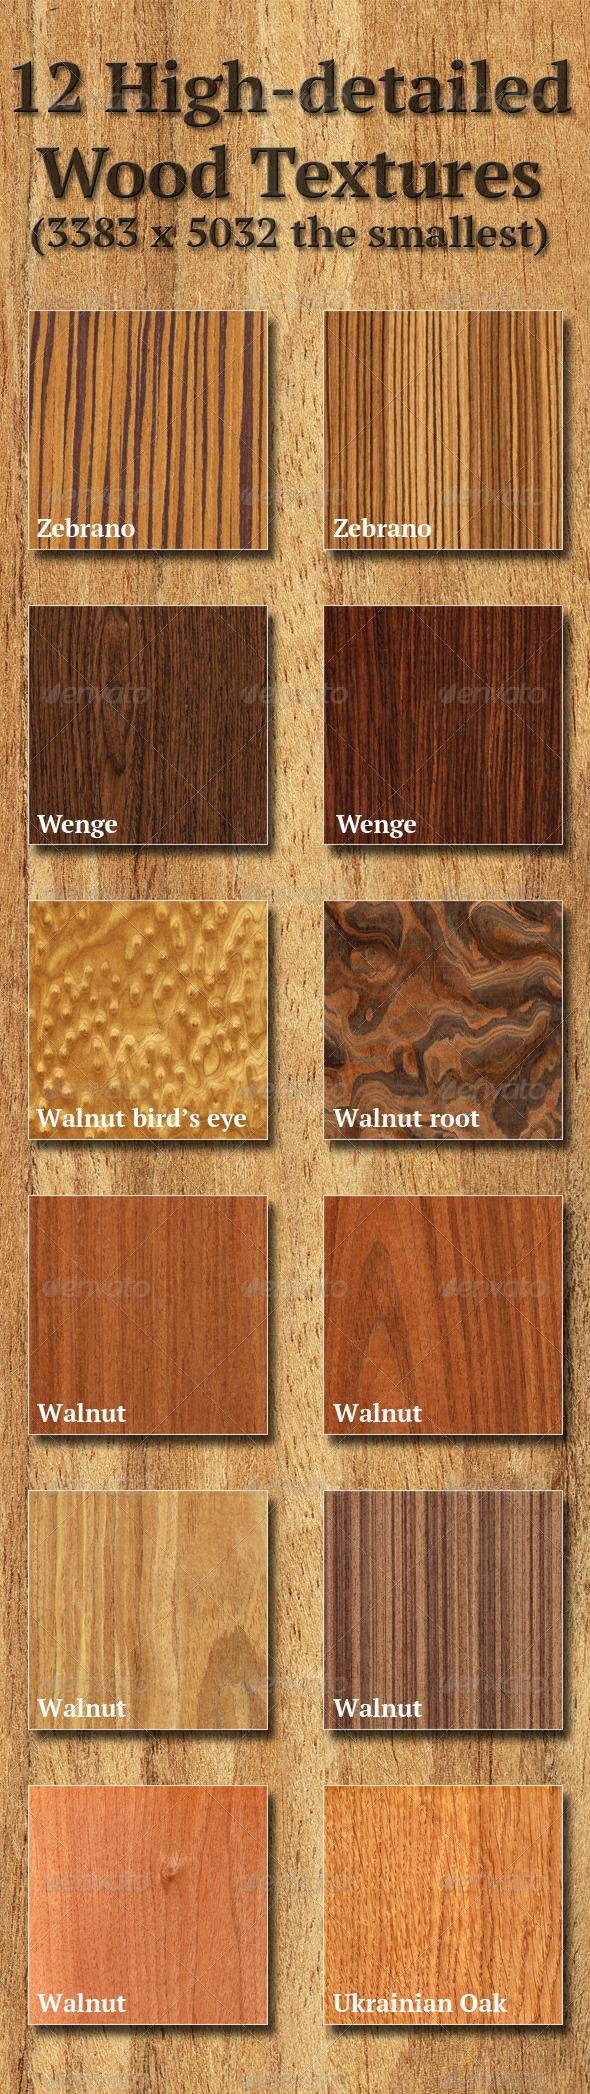 High-Detailed Wood Textures Set 4 - Wood Textures